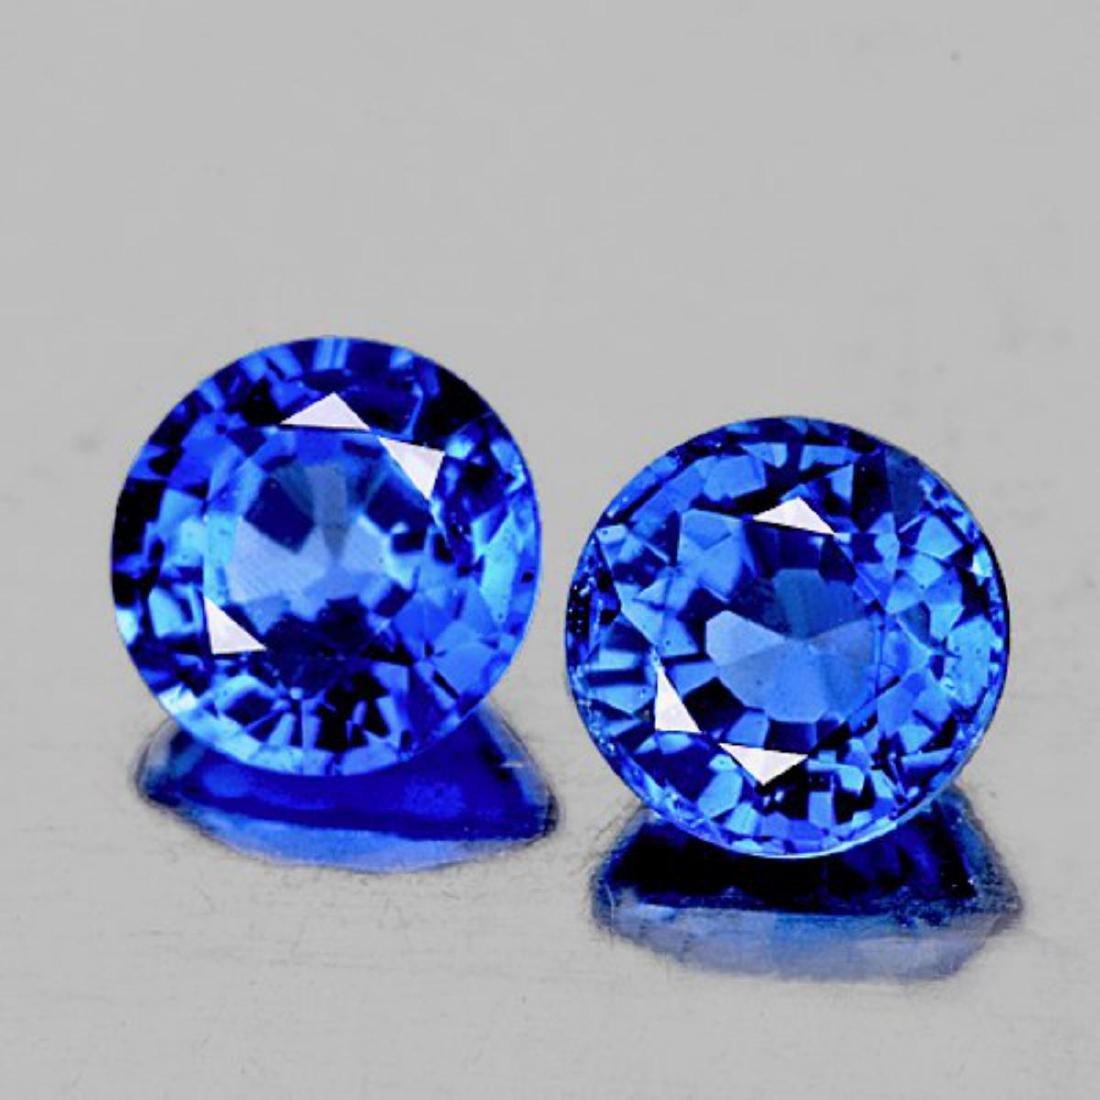 NATURAL  BLUE SAPPHIRE PAIR - VVS